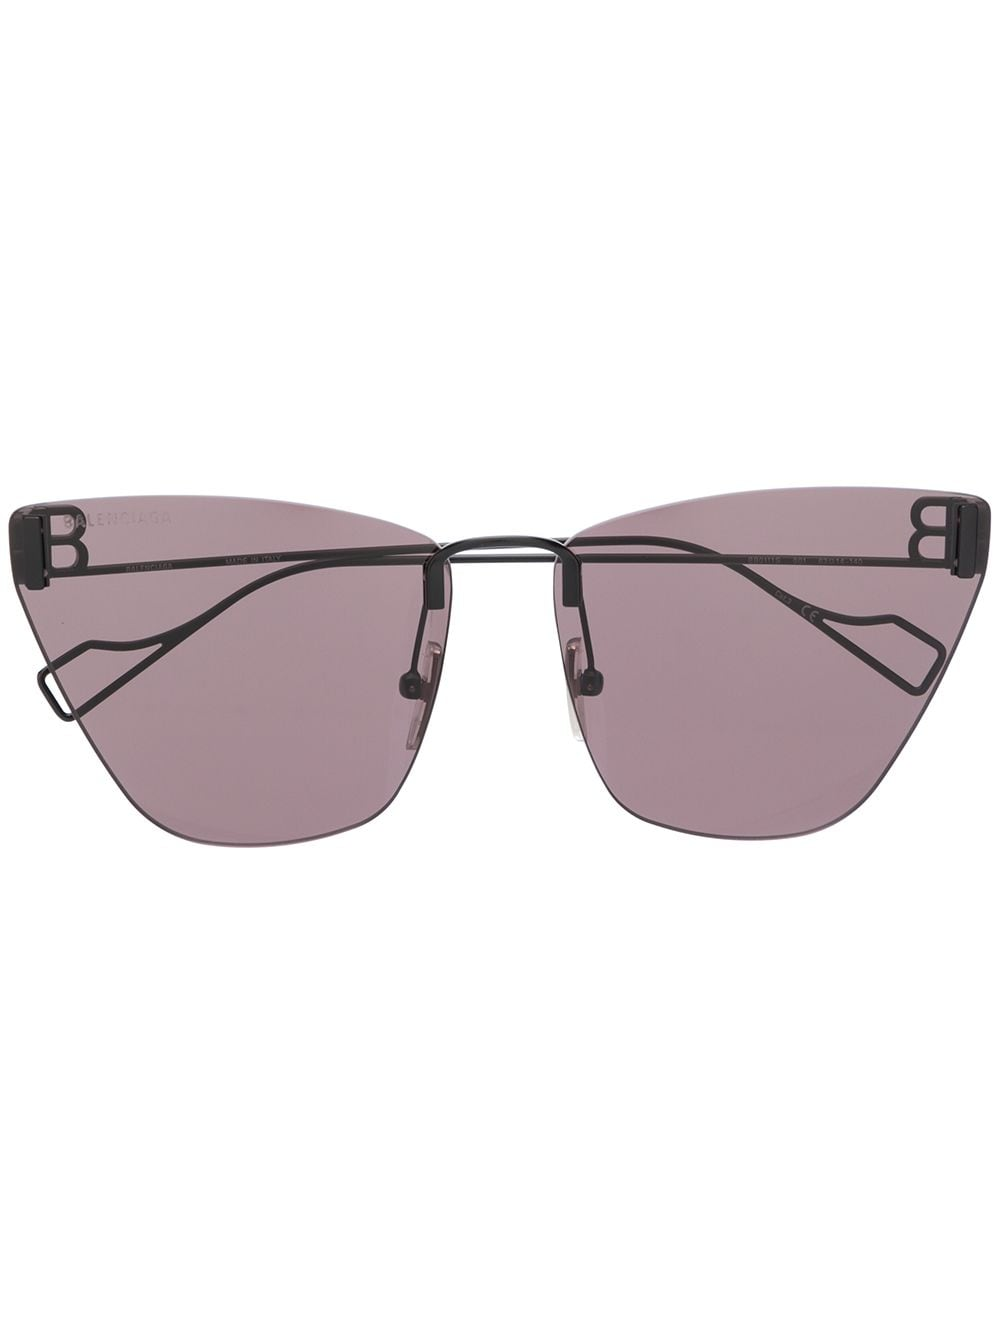 Light Cat Sunglasses